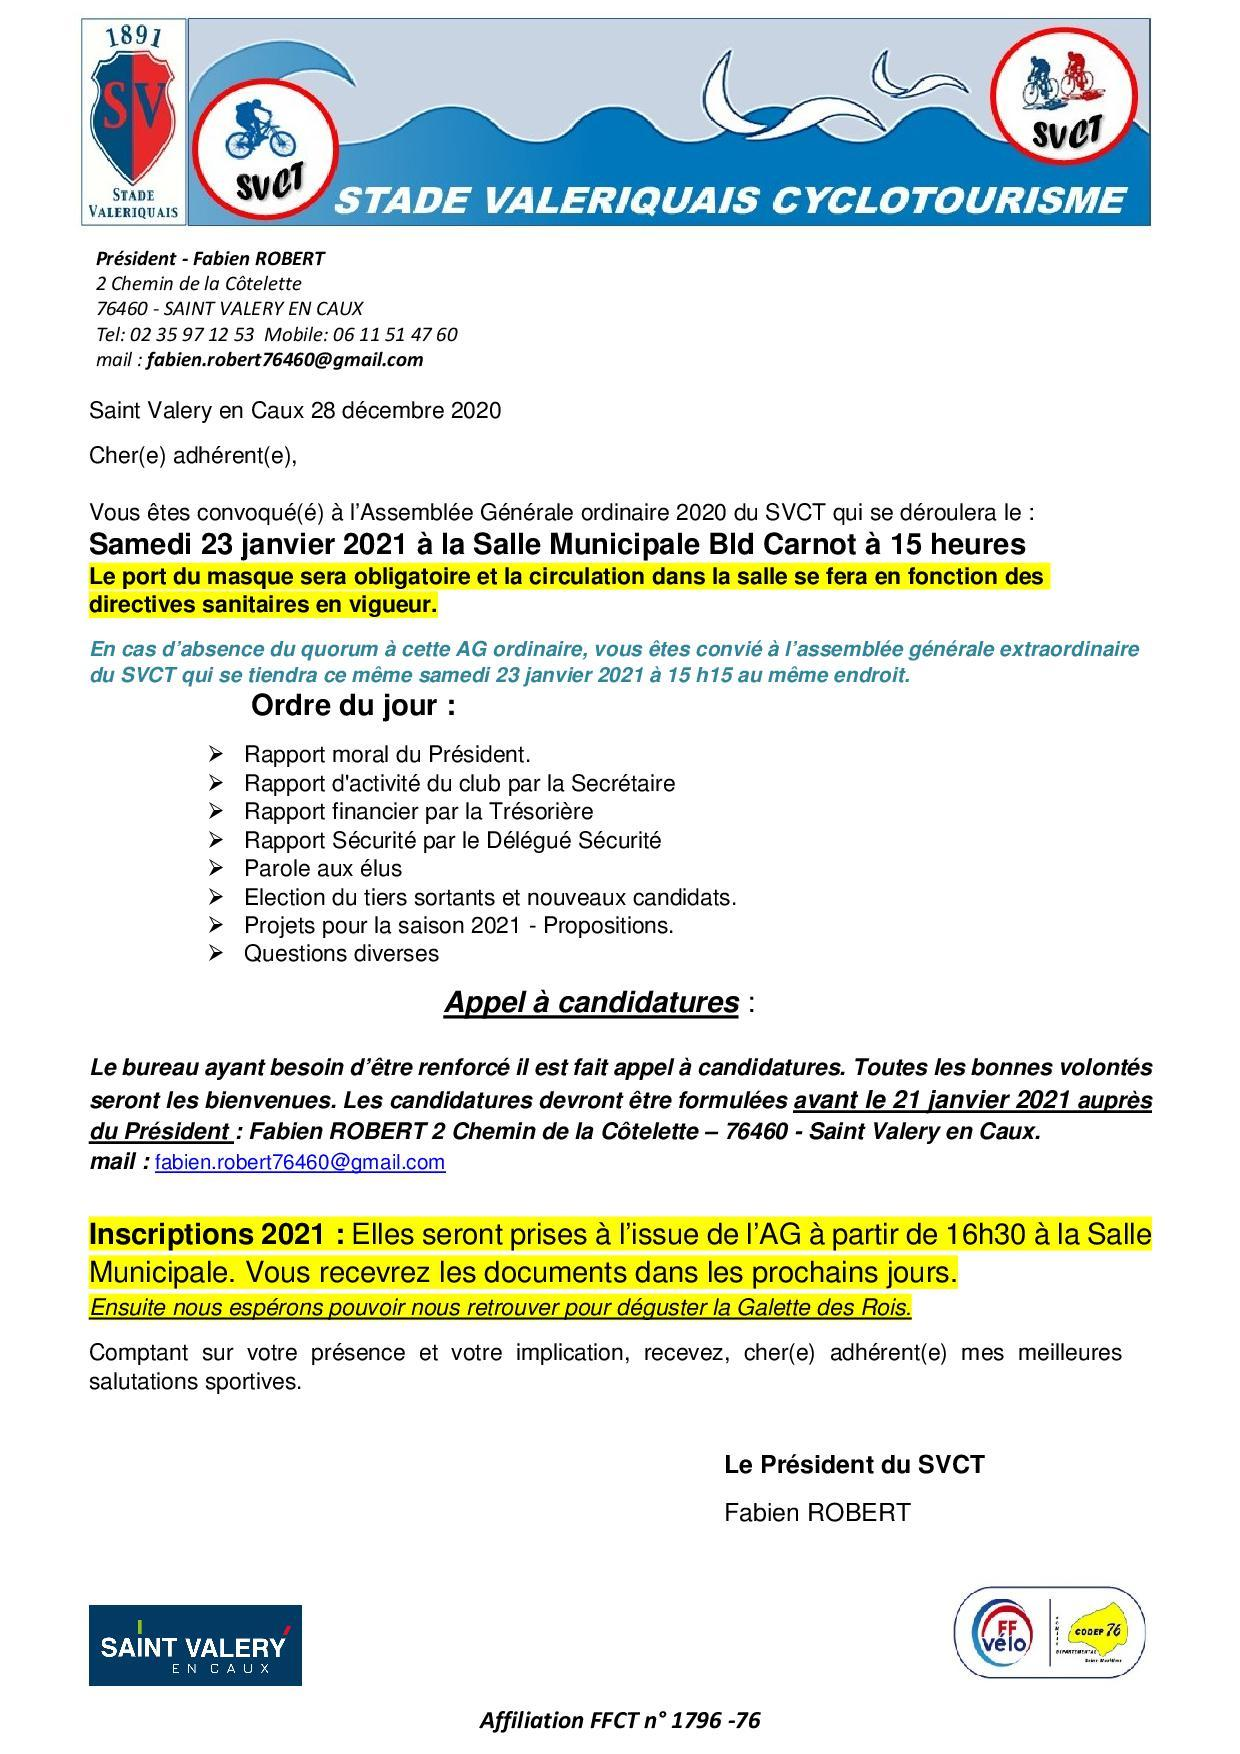 Ag 2020 convocation des licencies